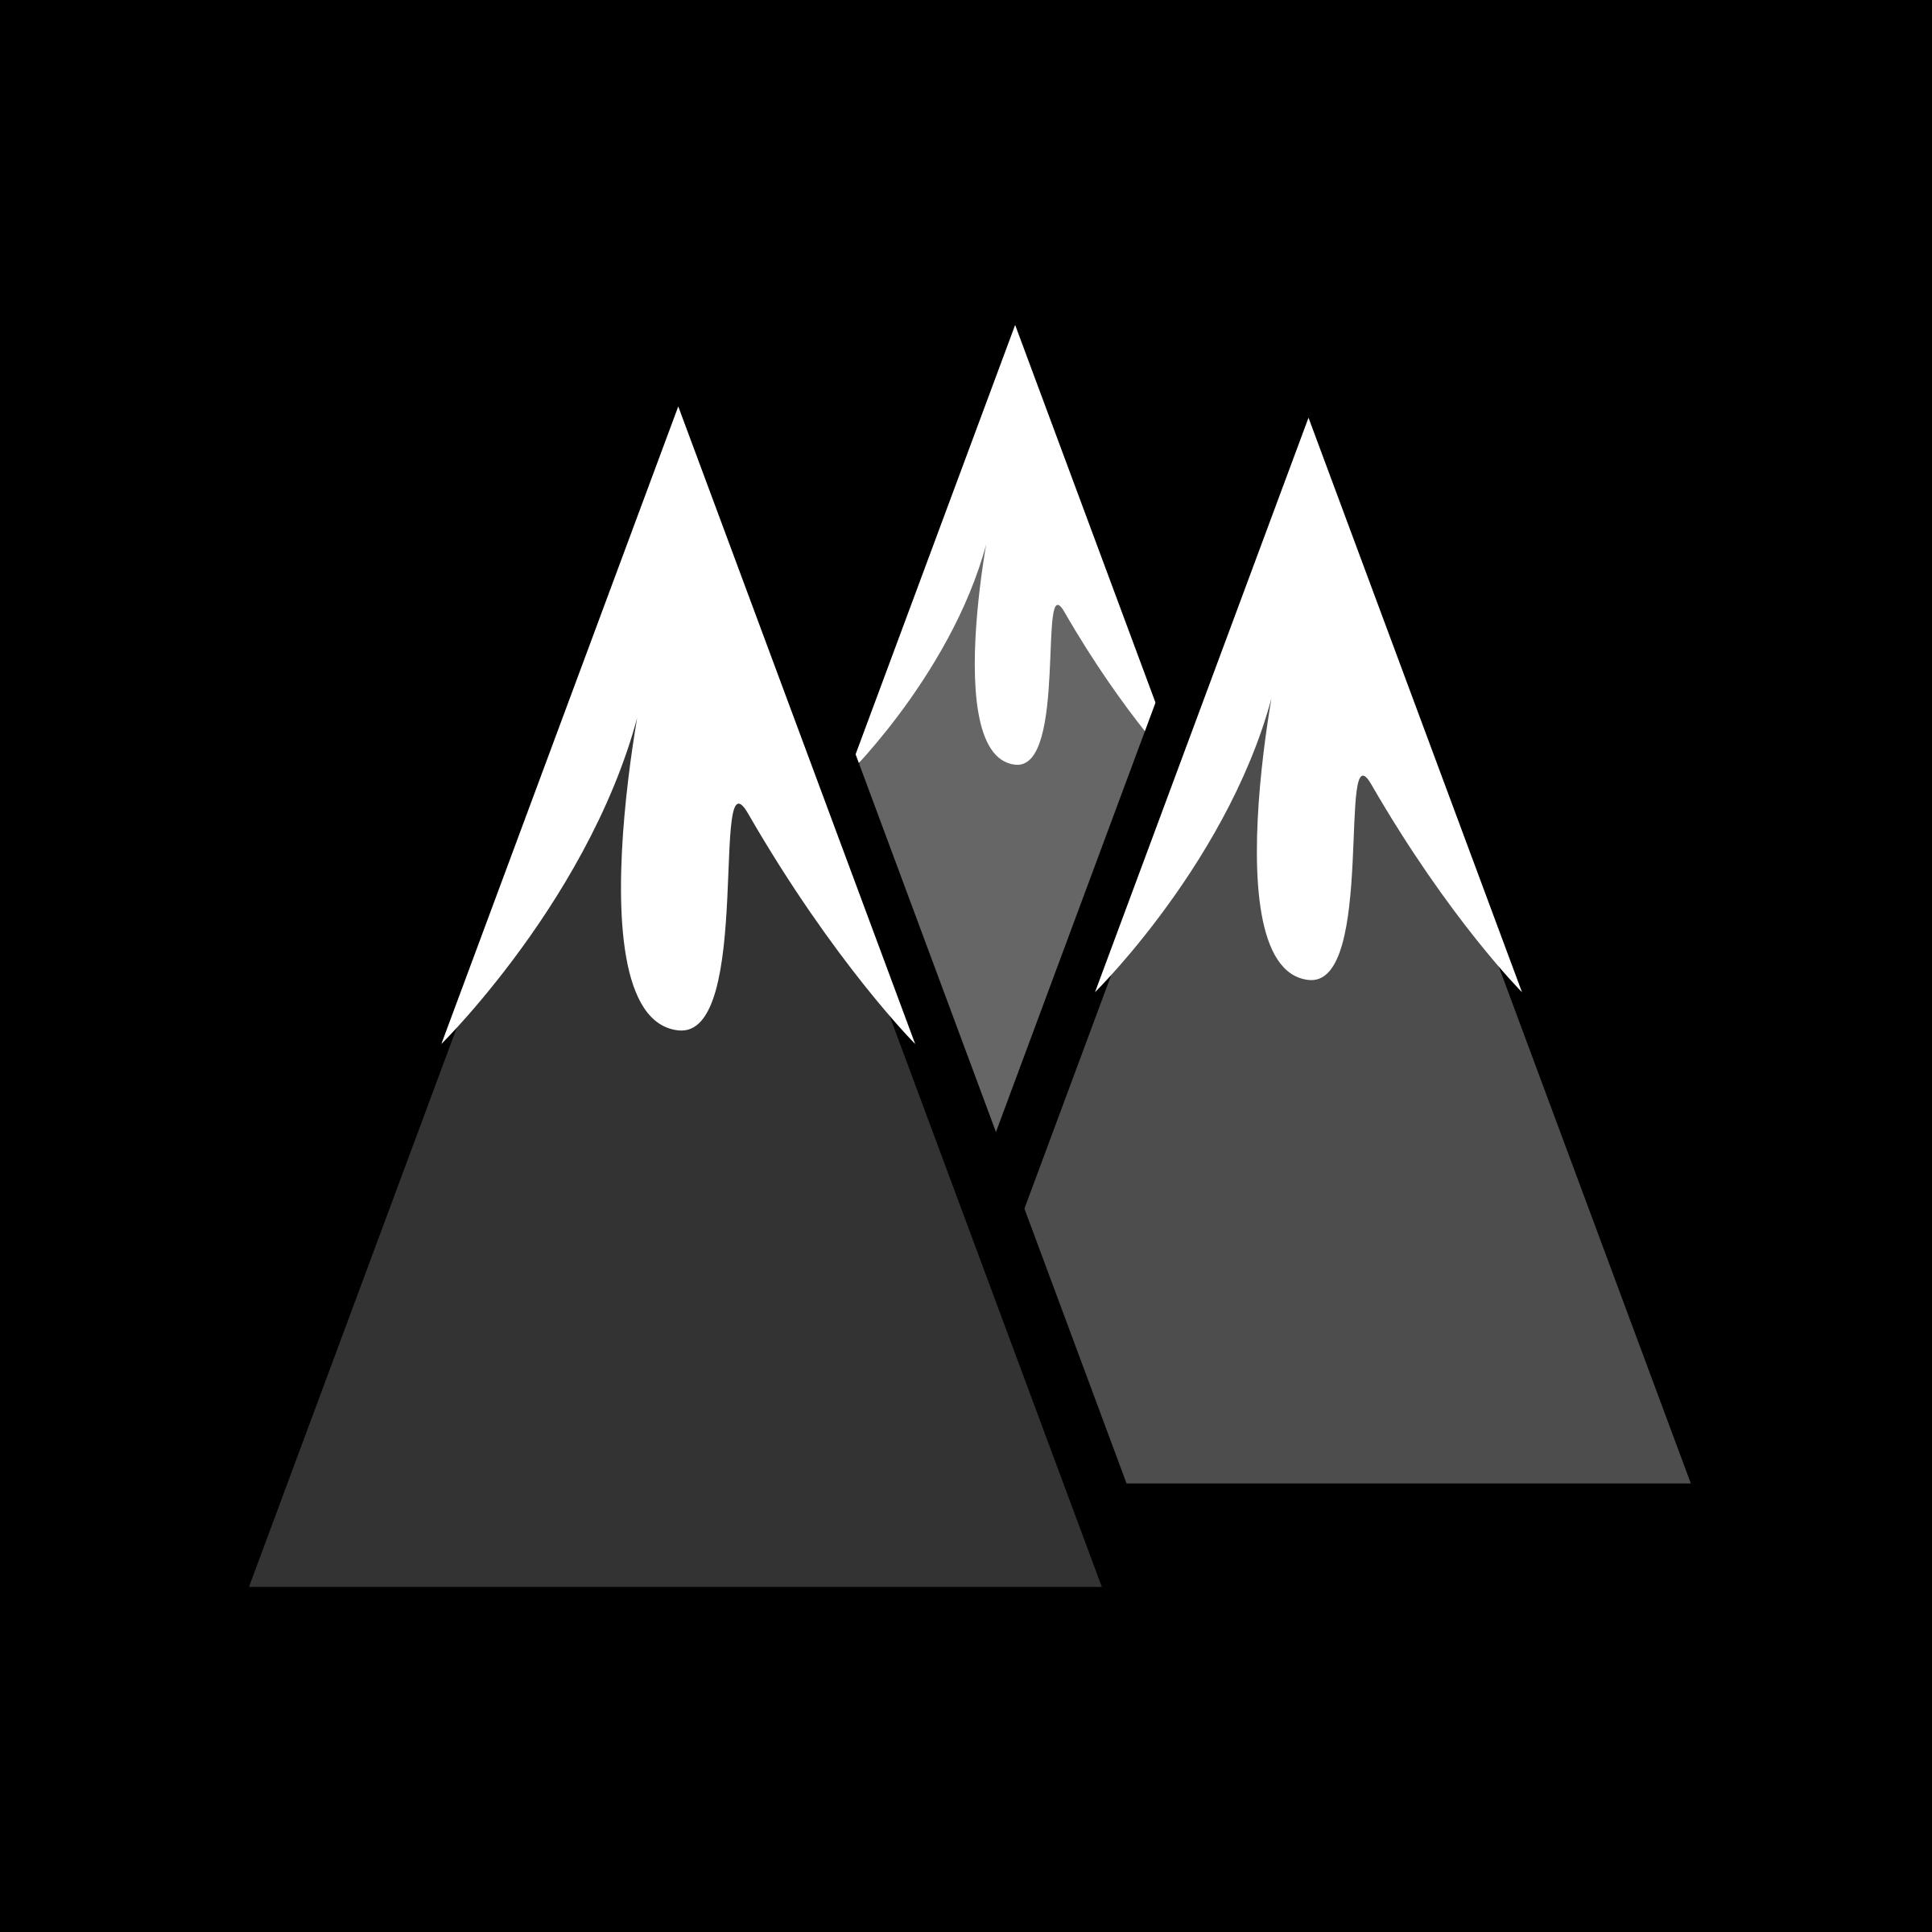 Mountain range clip art free clipart images 4